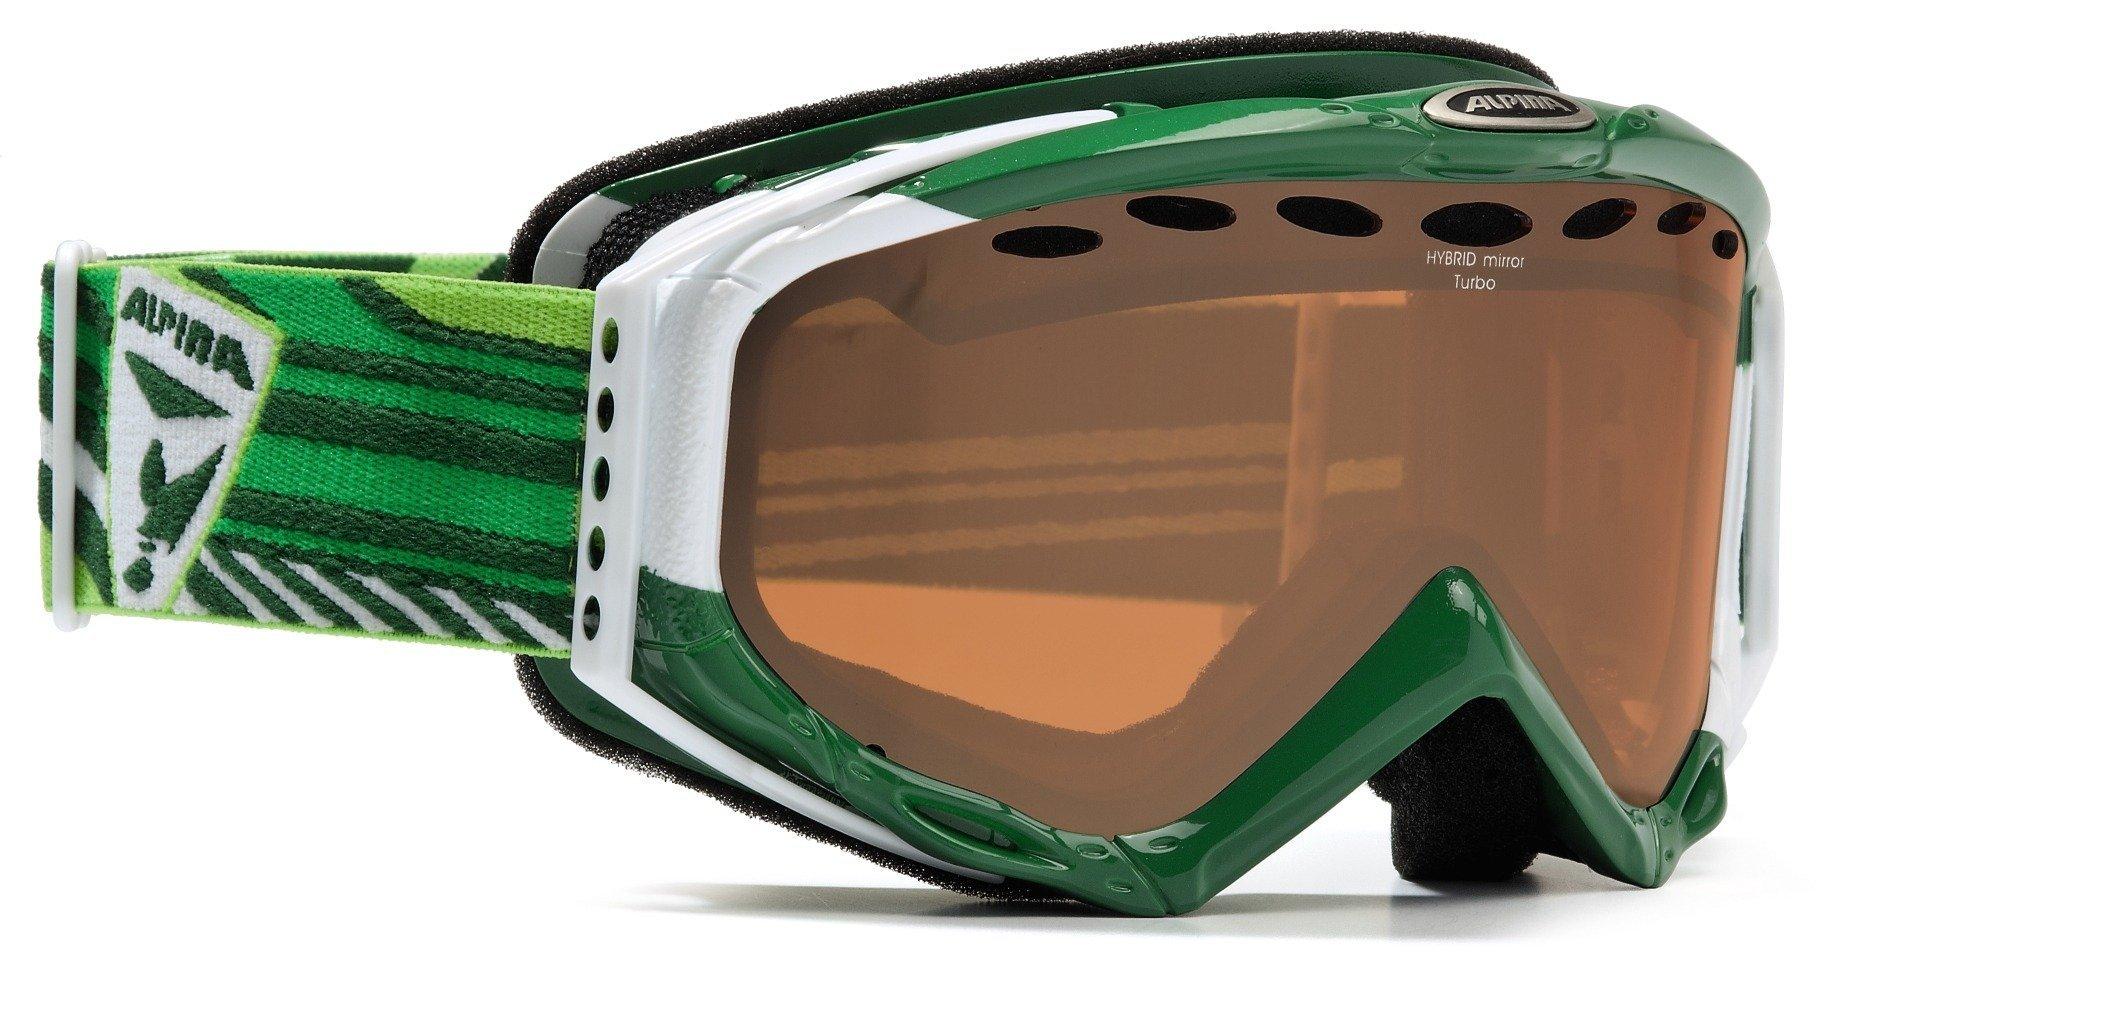 Alpina turbo hybrid mirror skibriller fra Alpina fra billigsport24